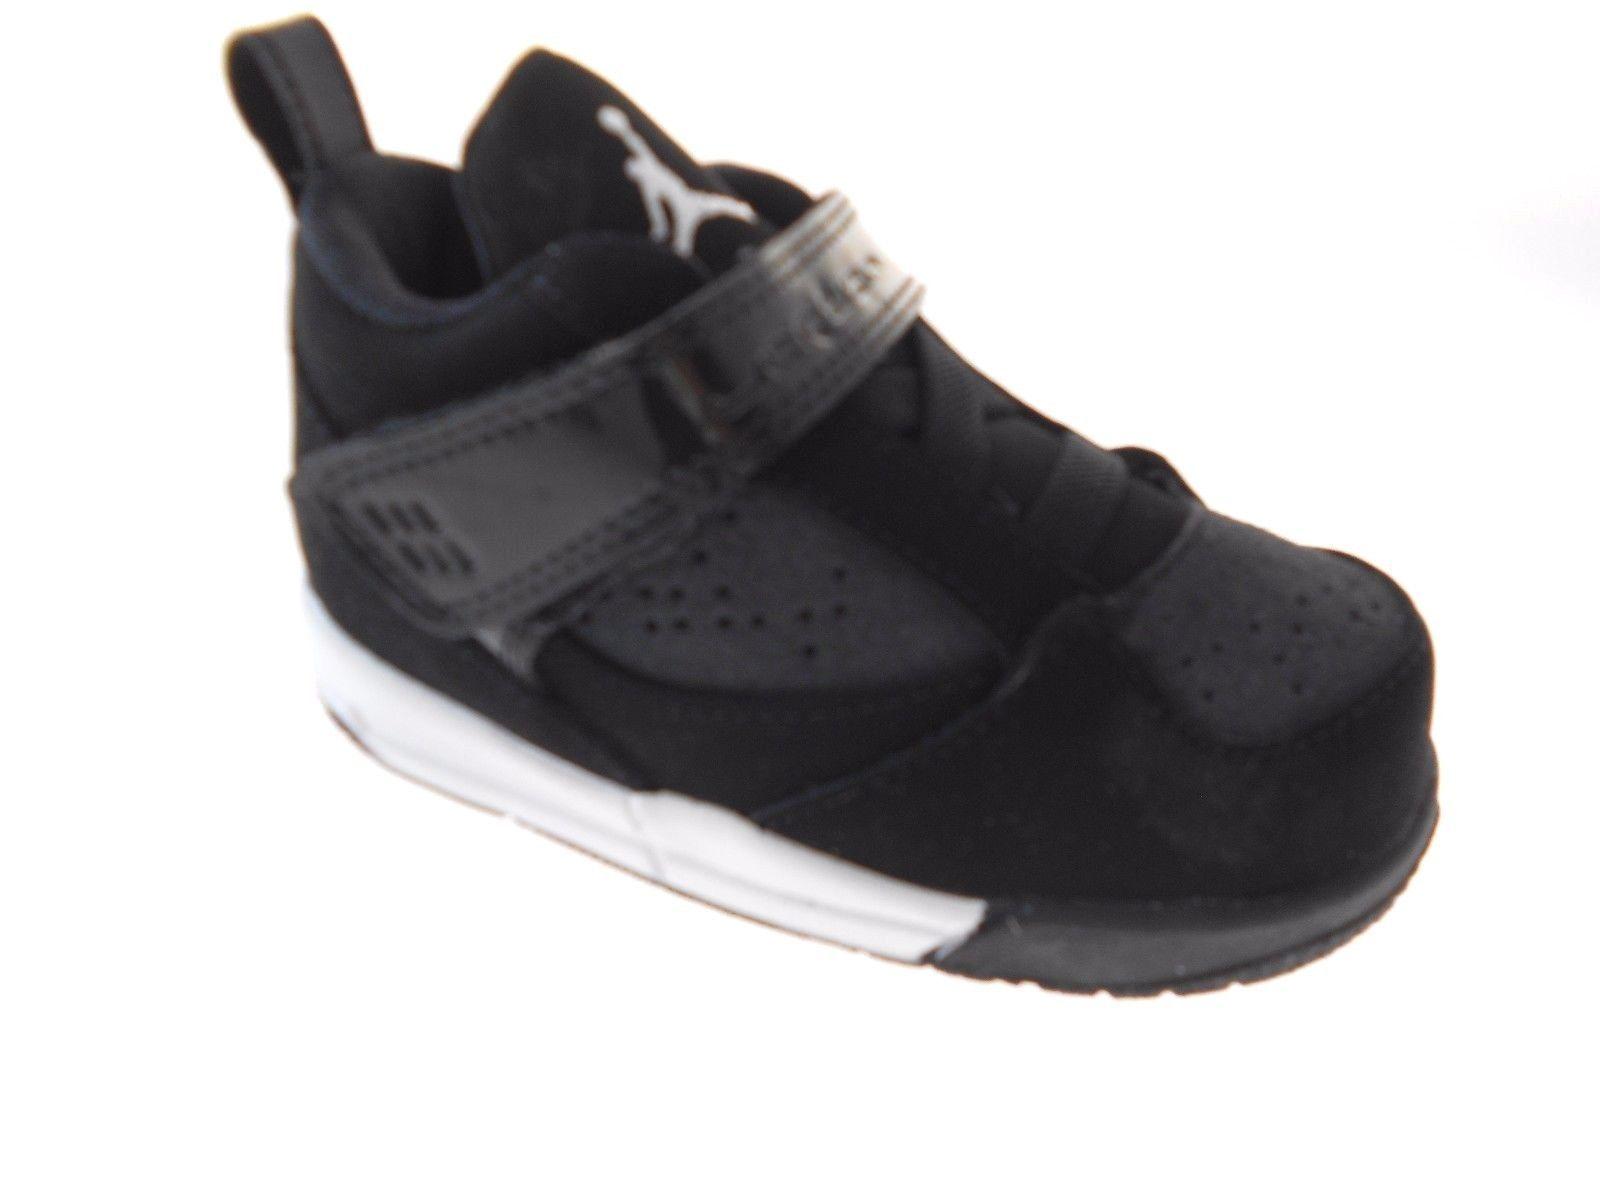 ccb85f1e2b Nike Jordan Flight 45(TD) Toddler Size 4C, and 50 similar items